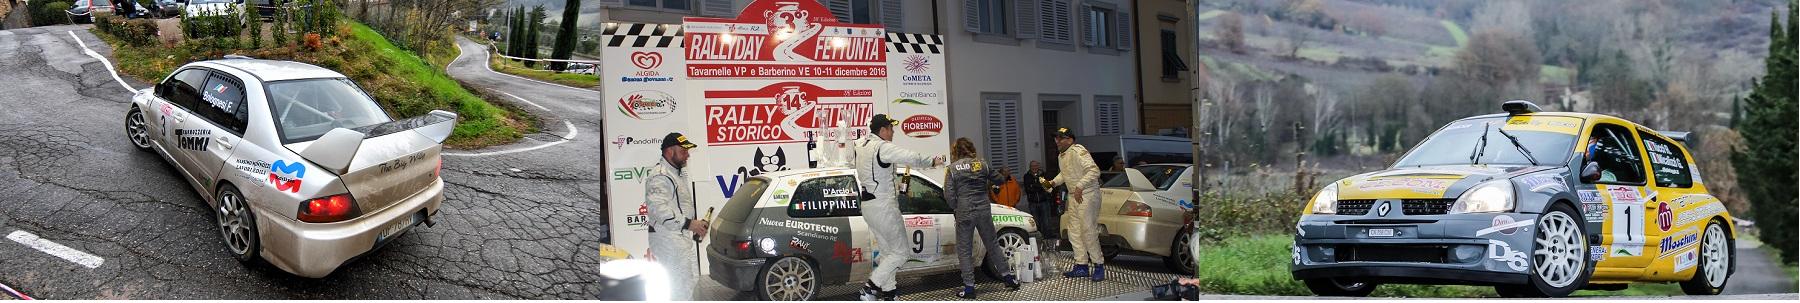 41° Rally della Fettunta